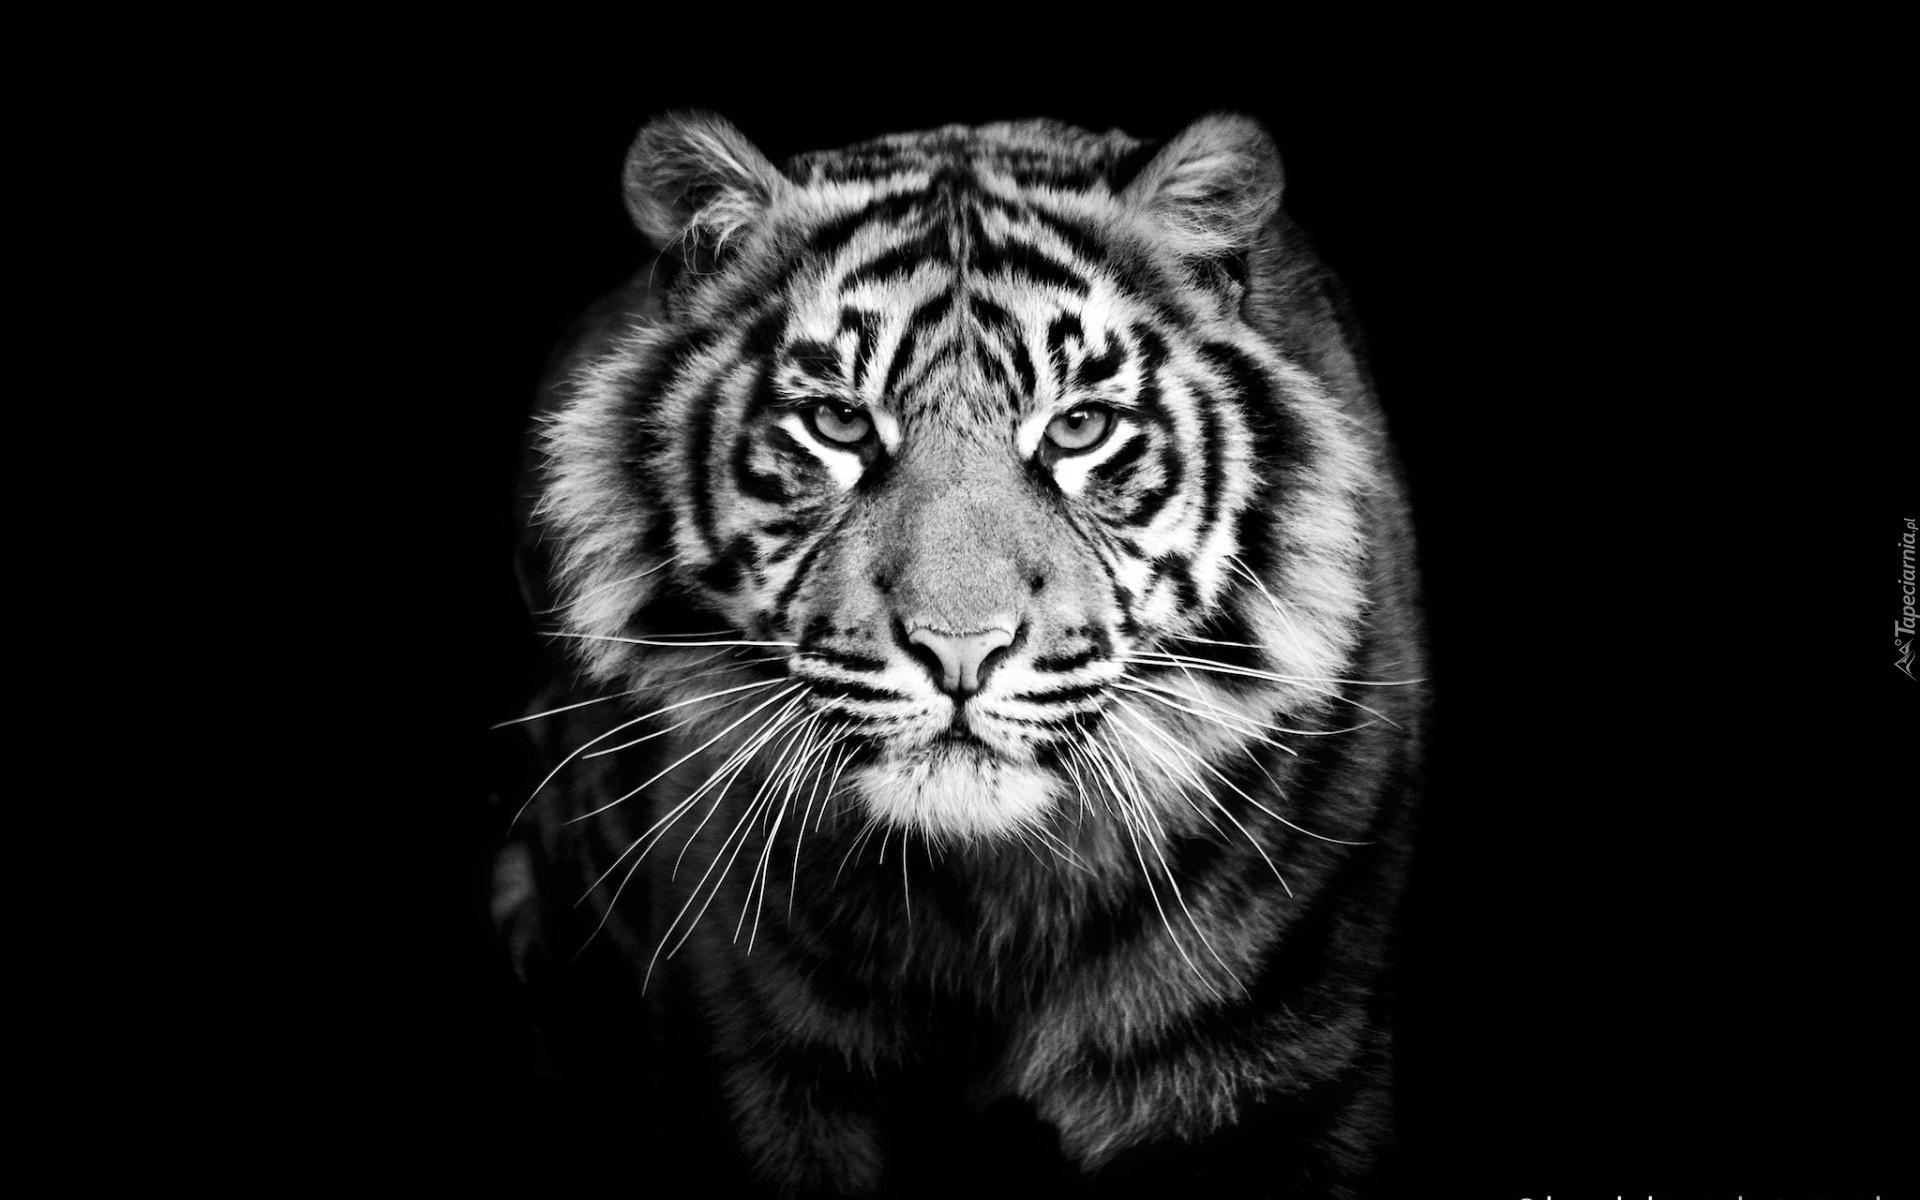 Leopard 4k Black Background Hd Animals 4k Wallpapers: Tygrys